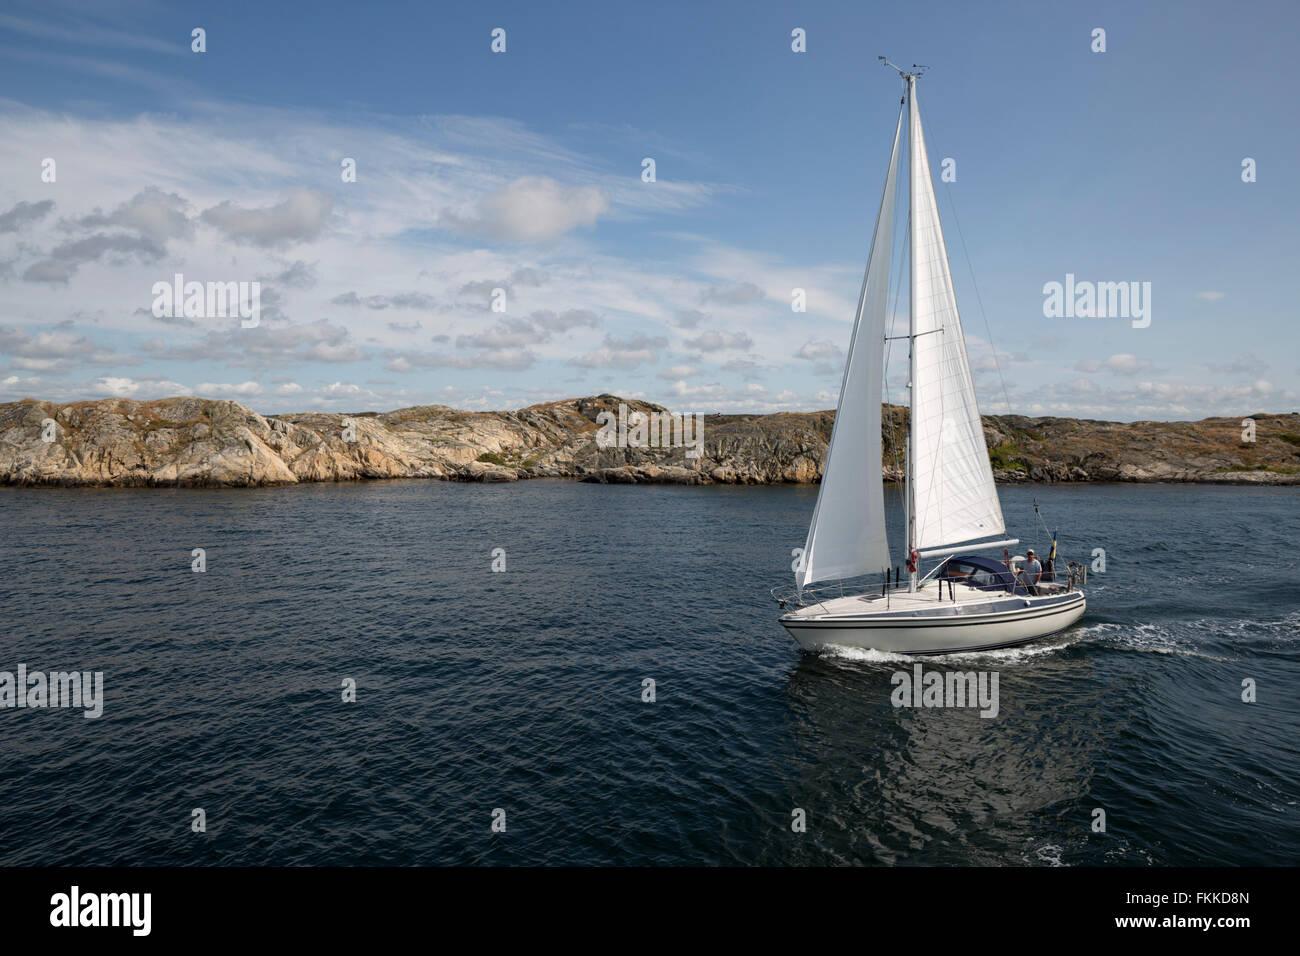 Yacht sailing along rocky coastline, Bohuslän Coast, Southwest Sweden, Sweden, Scandinavia, Europe - Stock Image